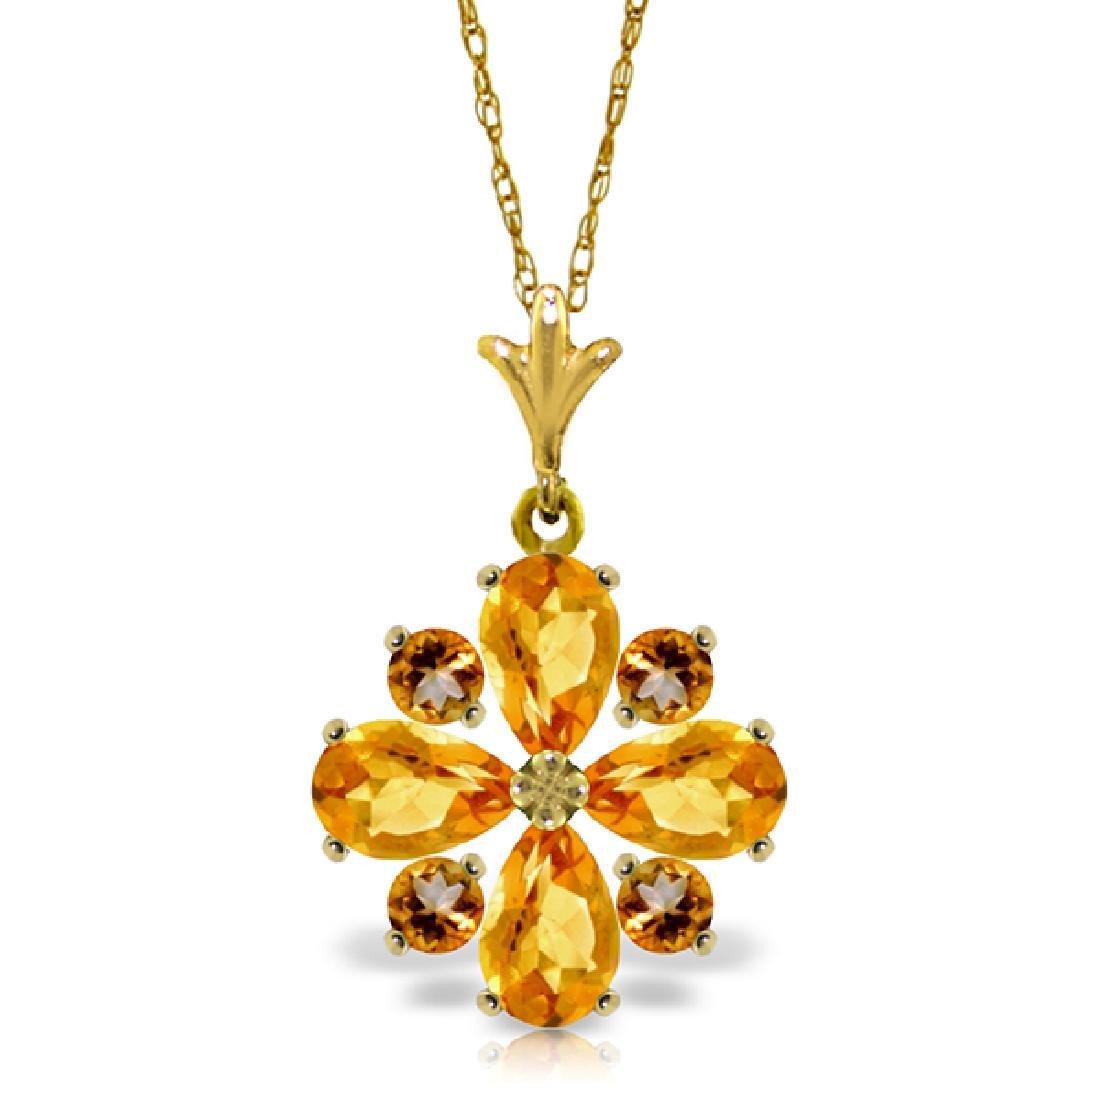 Genuine 2.43 ctw Citrine Necklace Jewelry 14KT Yellow